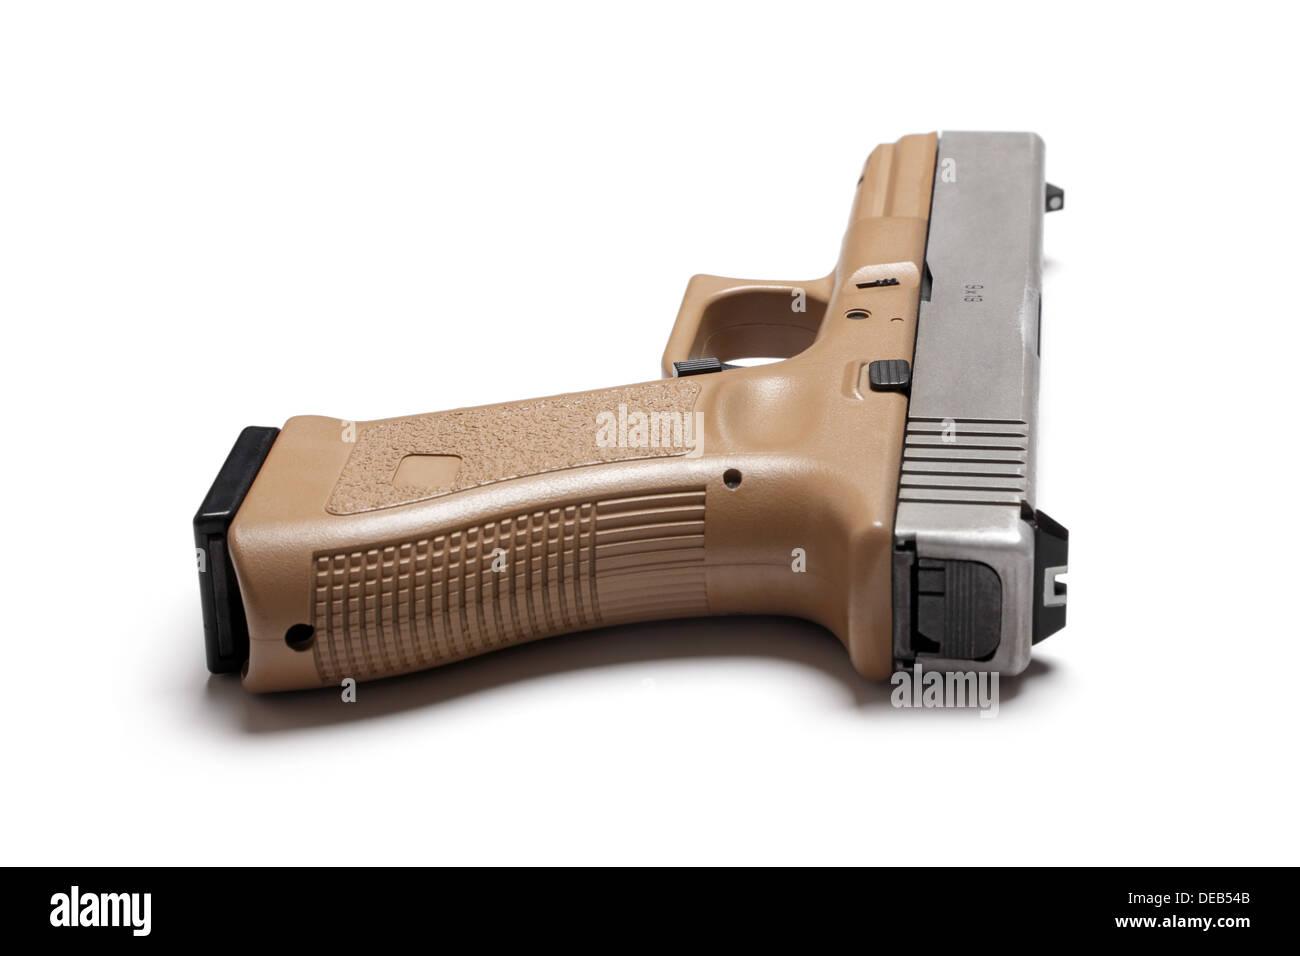 Glock 17 Pistol Stock Photos Glock 17 Pistol Stock Images Alamy